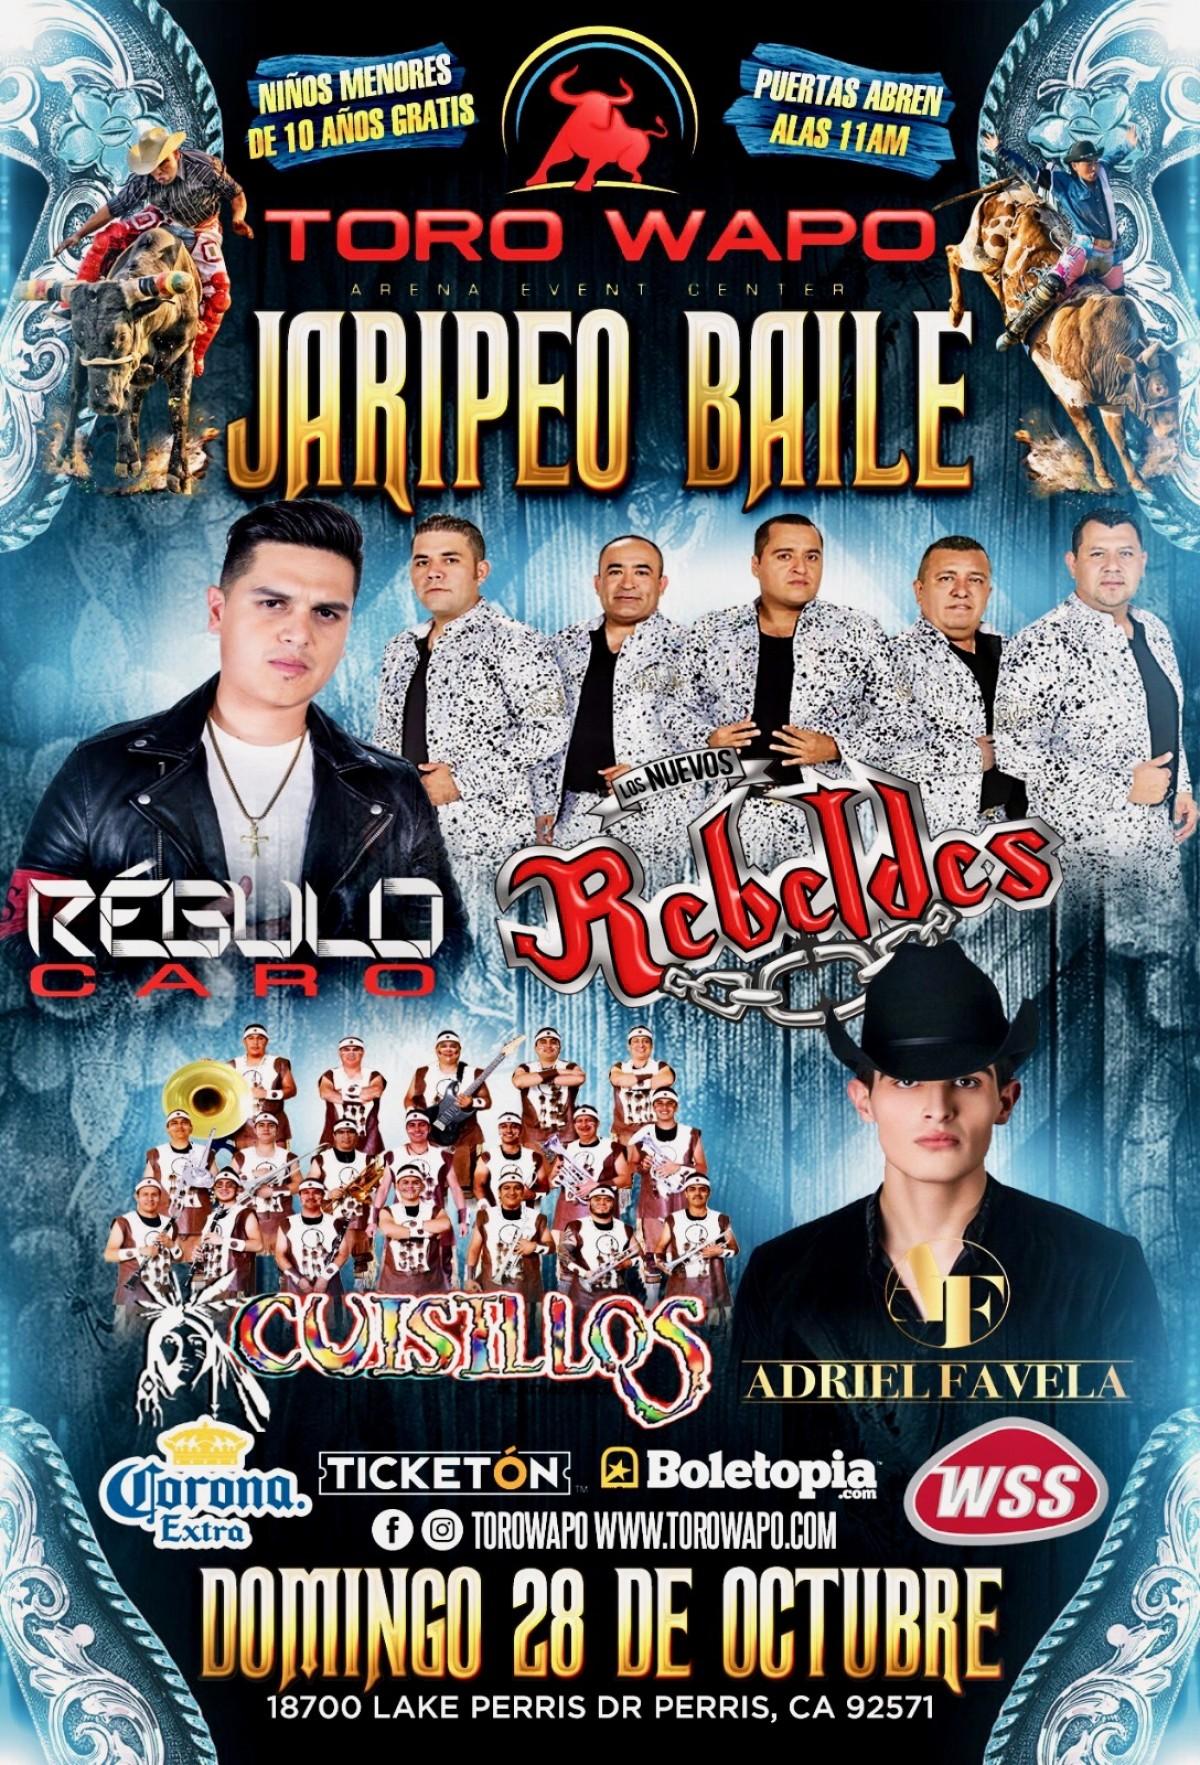 Jaripeo Baile | Toro Wapo